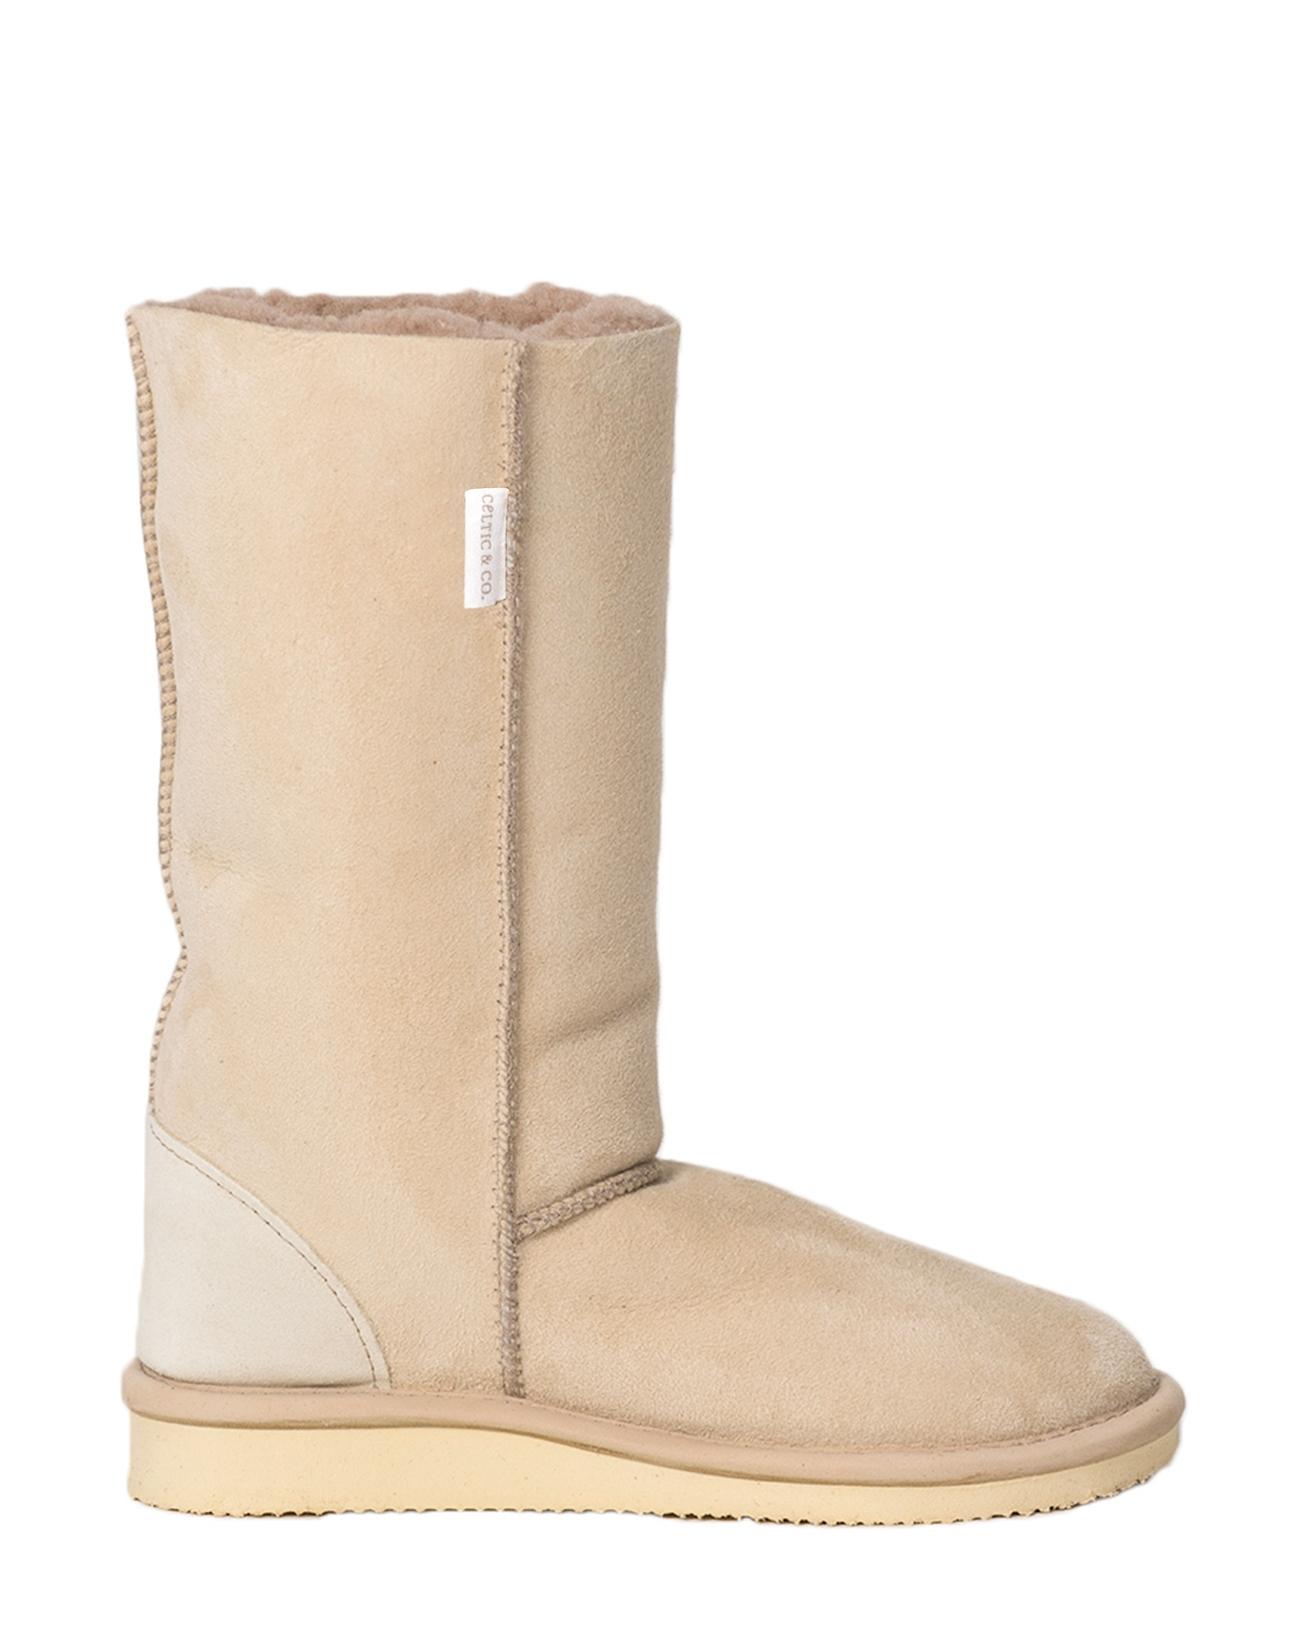 7674a10c768 Celt House Boots - Calf